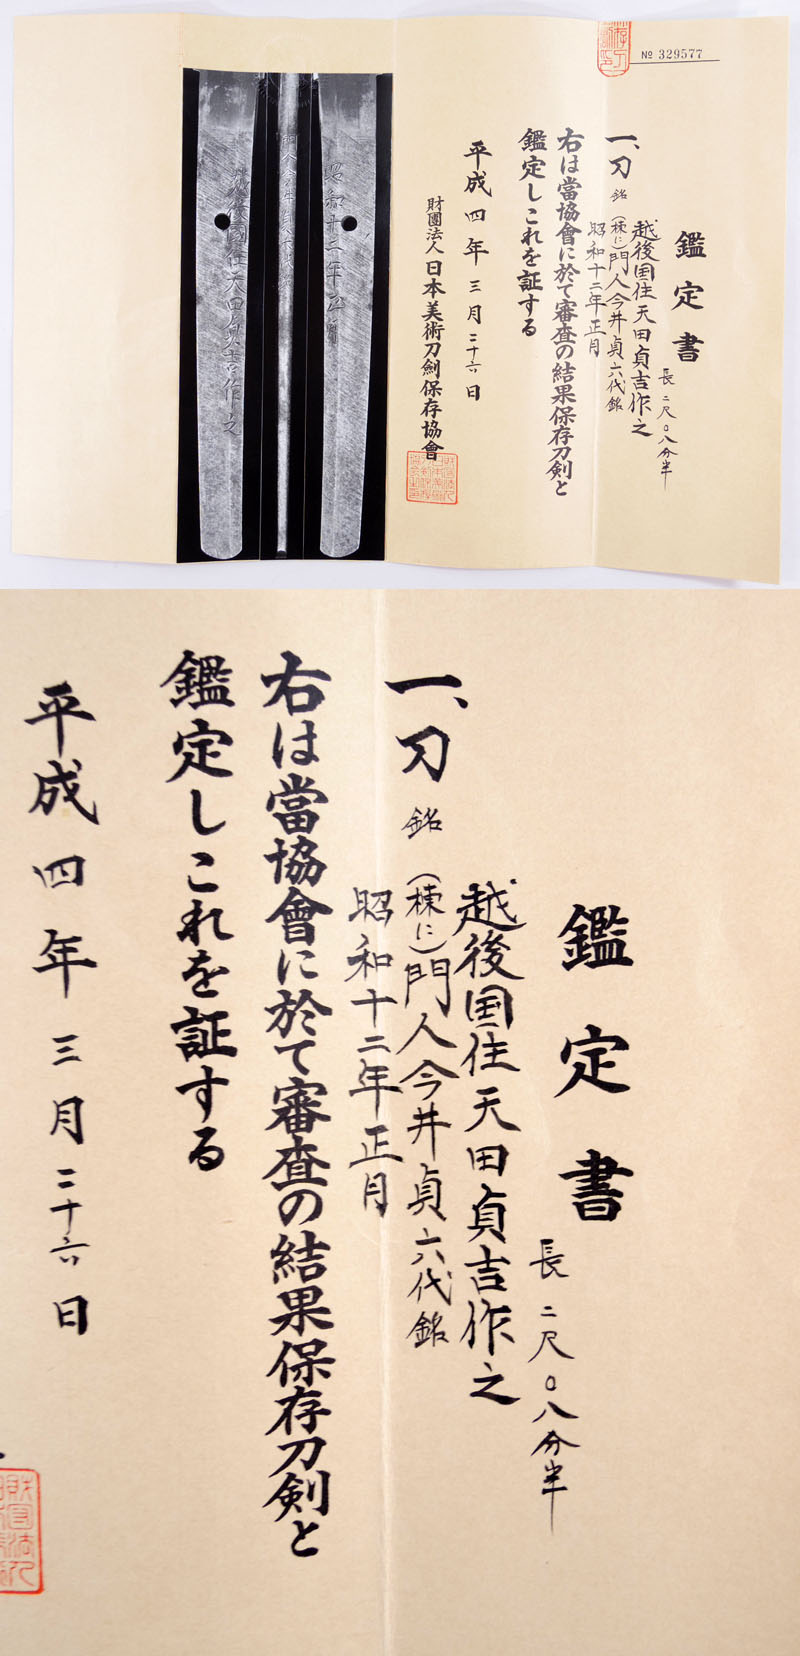 越後国住天田貞吉作之(天田 昭次の父) Picture of Certificate